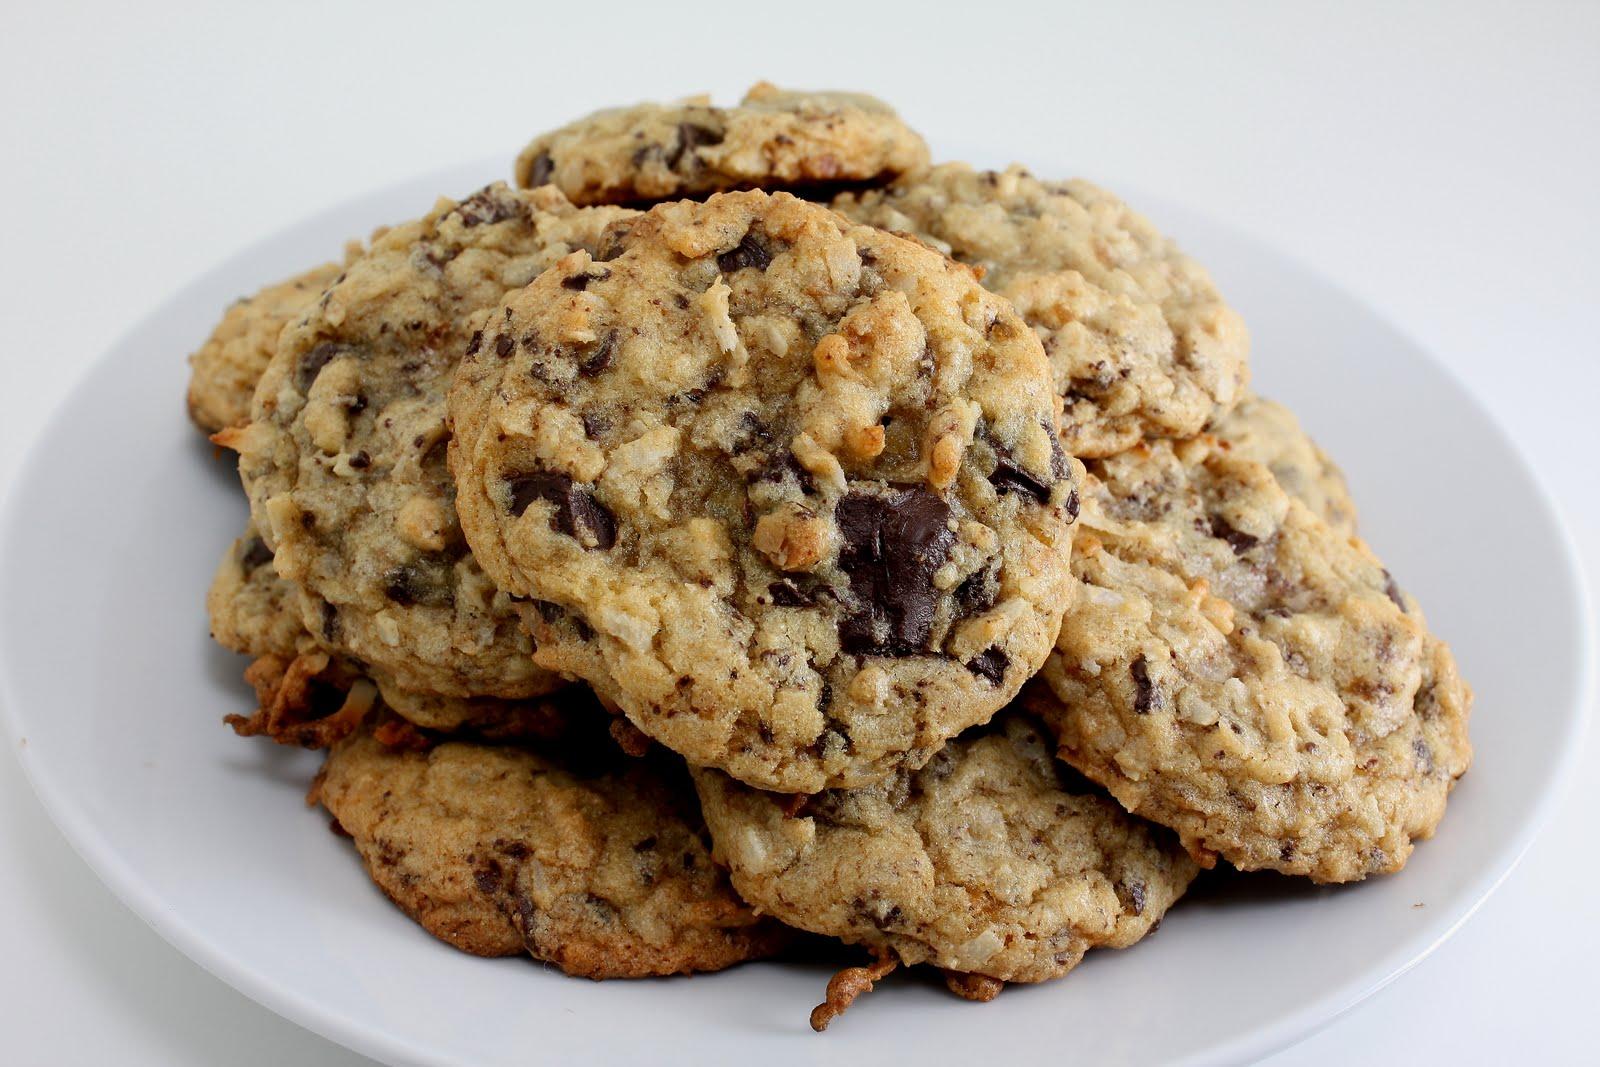 Elizabeth's Edible Experience: Cookie Comeback